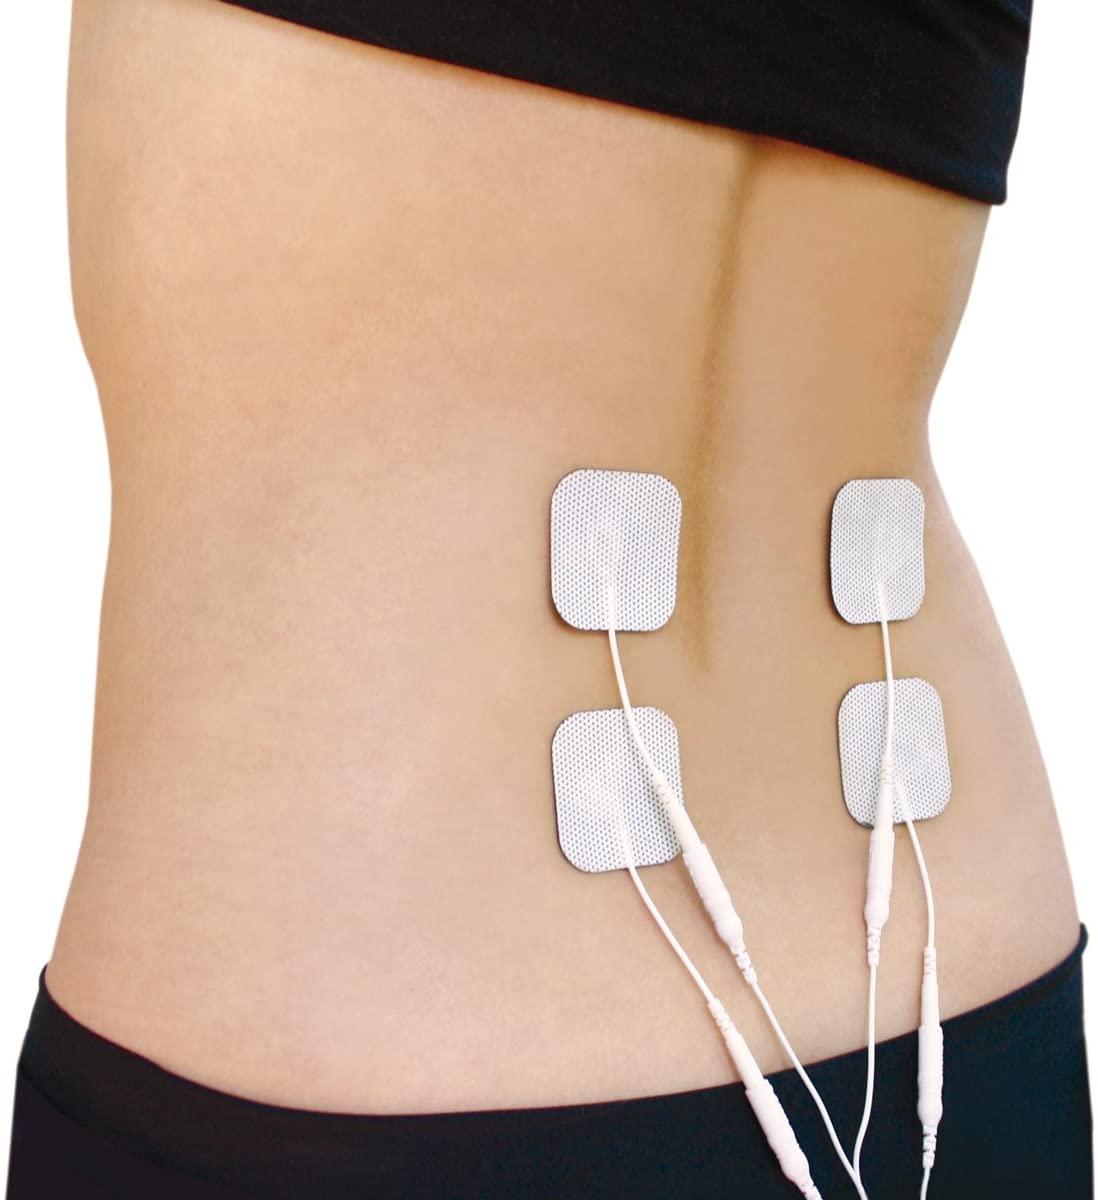 comprar electroestimulador muscular